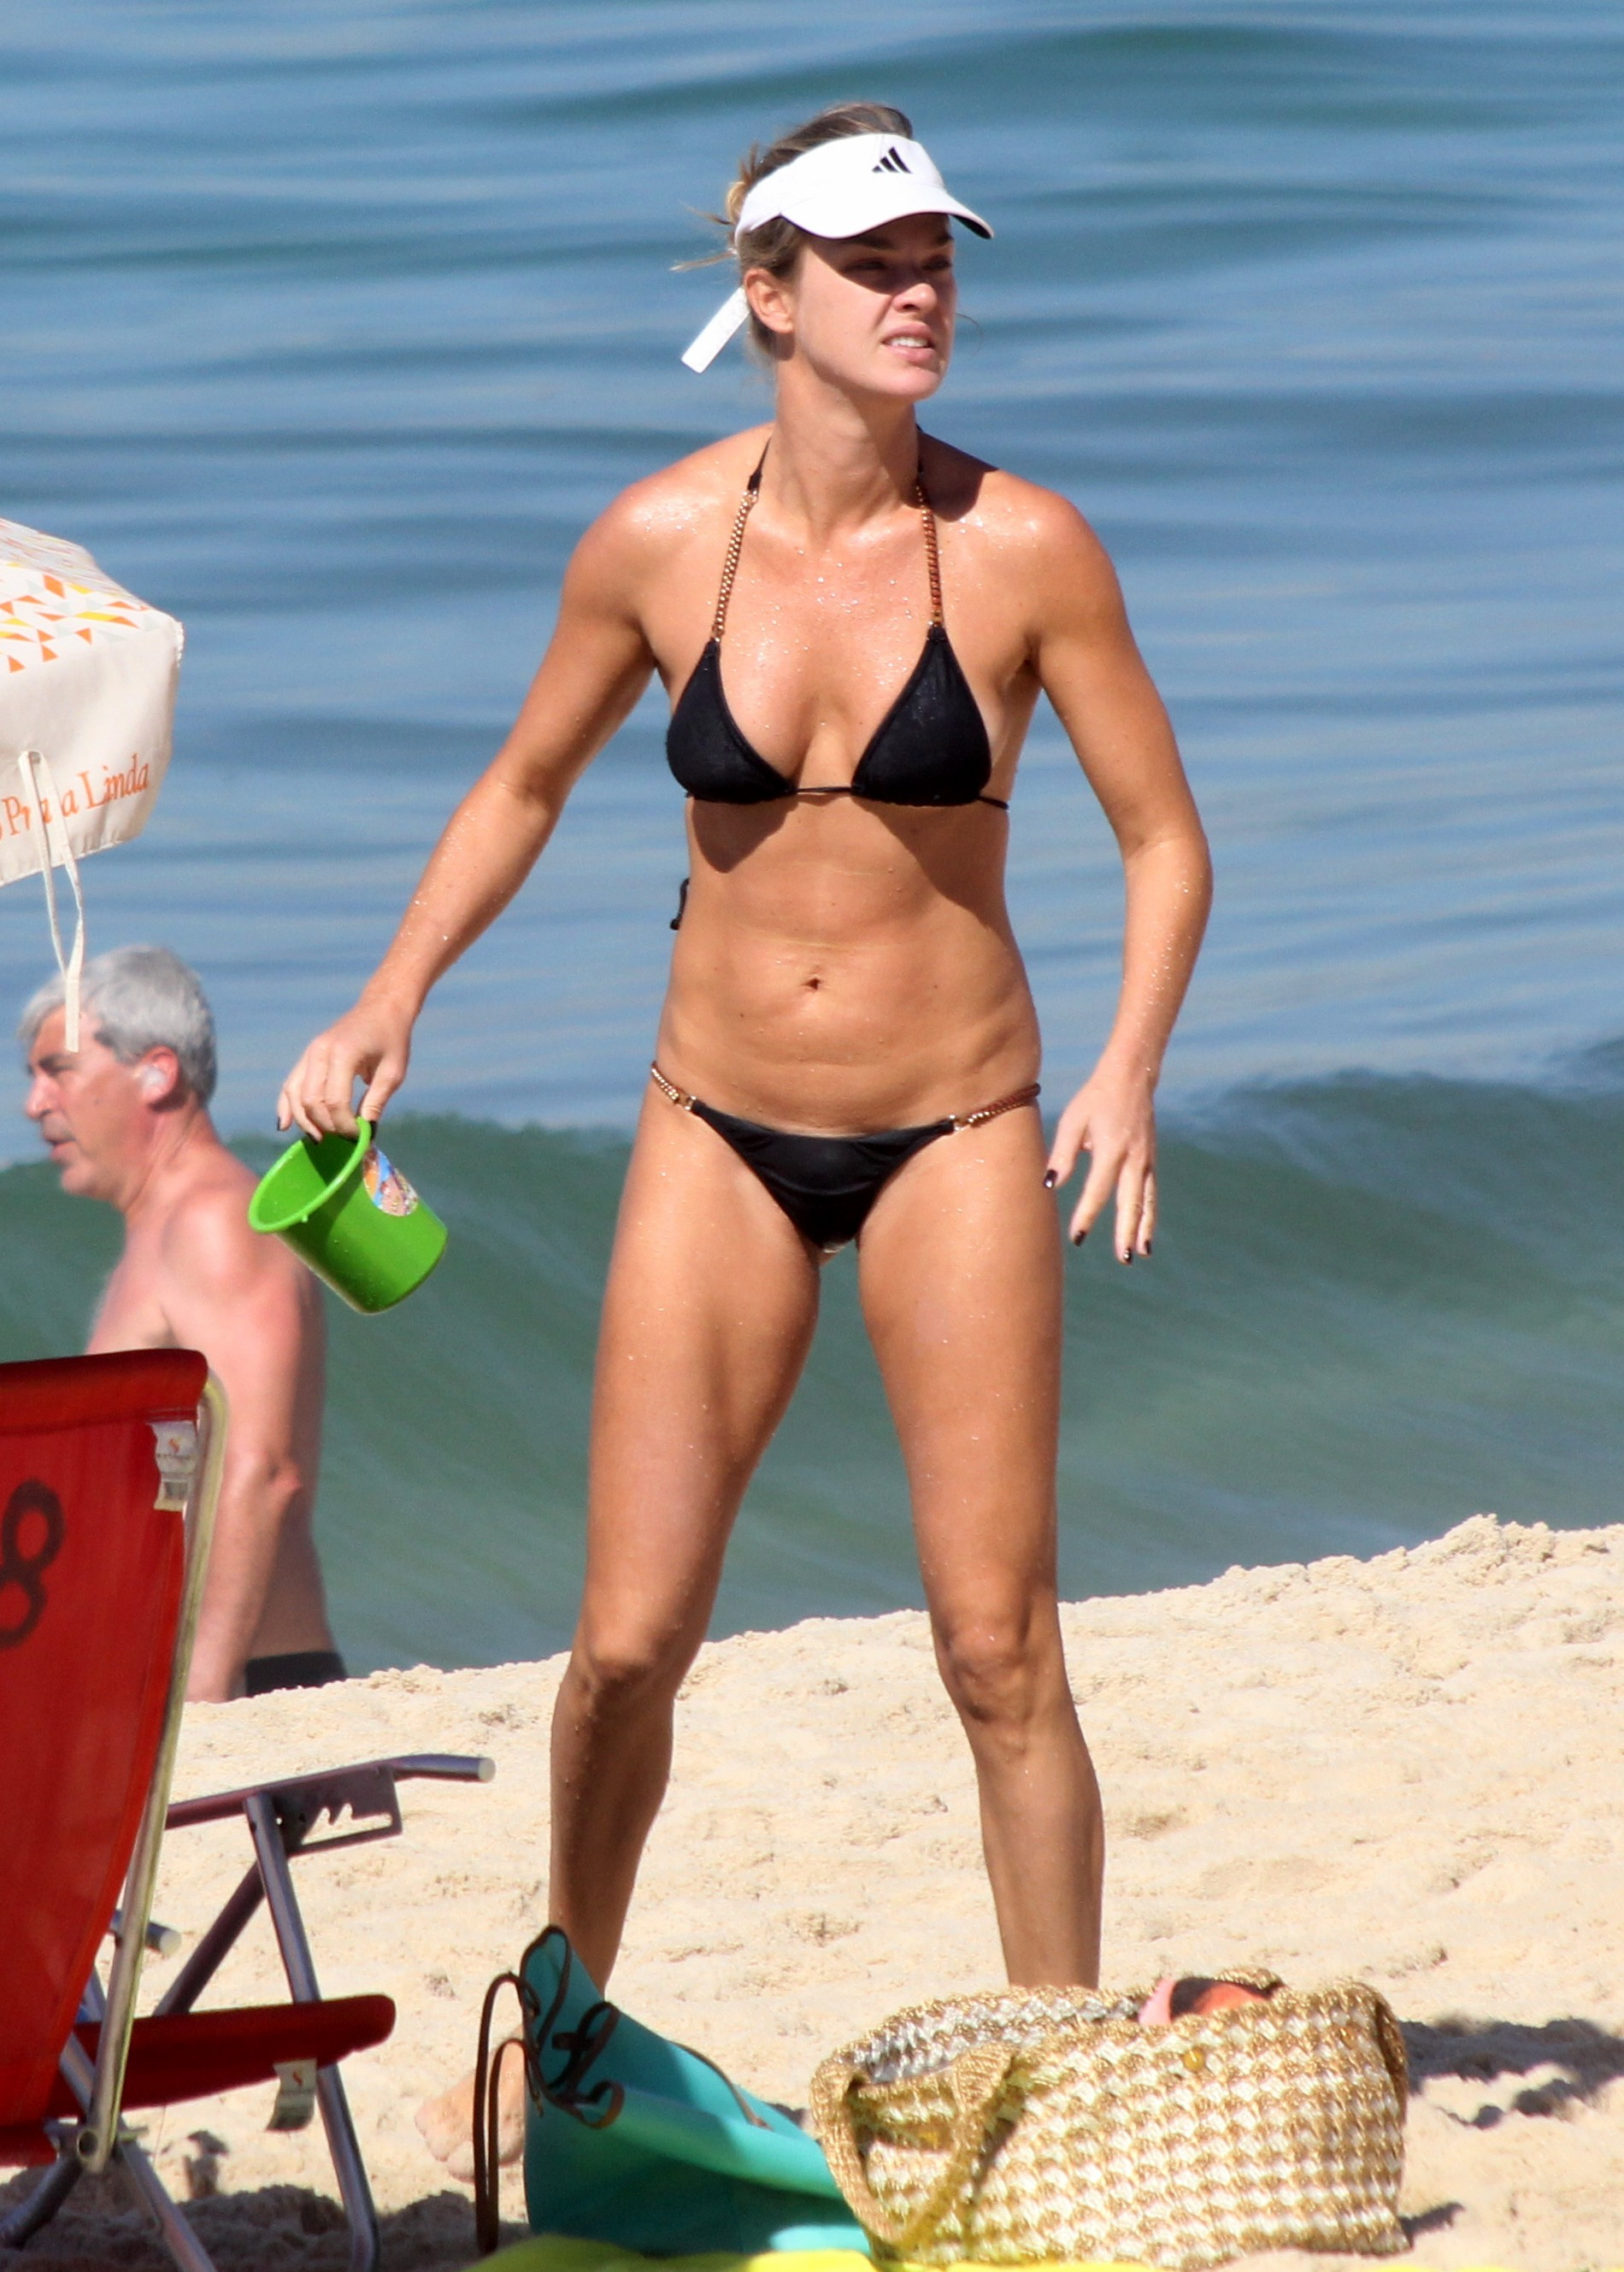 Bikini Leticia Birkheuer nudes (63 photos), Pussy